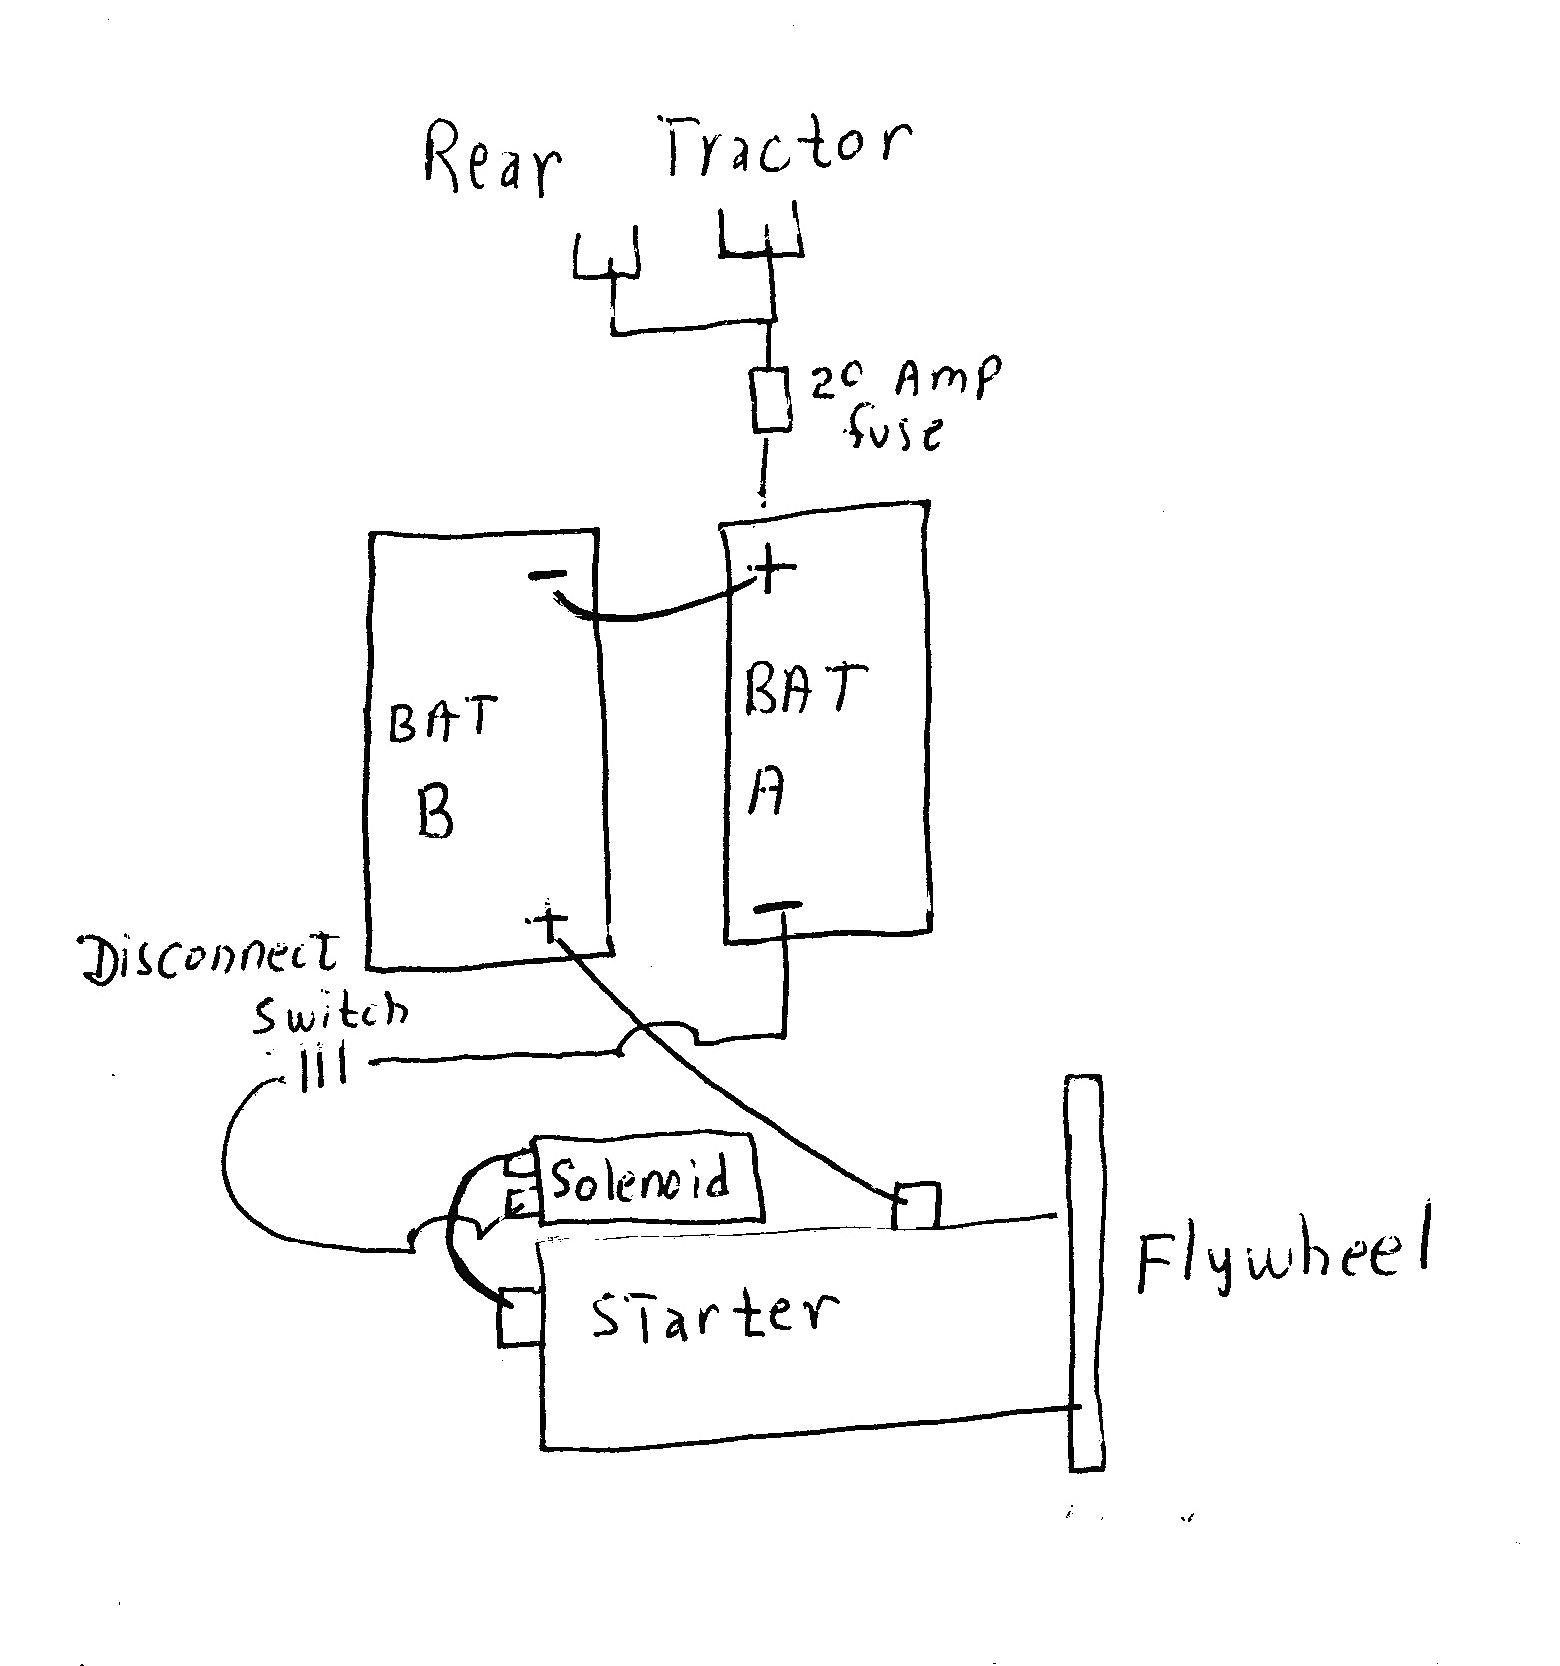 wiring diagram 3010 john deere tractor data wiring diagrams u2022 rh mikeadkinsguitar com john deere 3010 gas wiring diagram john deere 3010 light wiring diagram